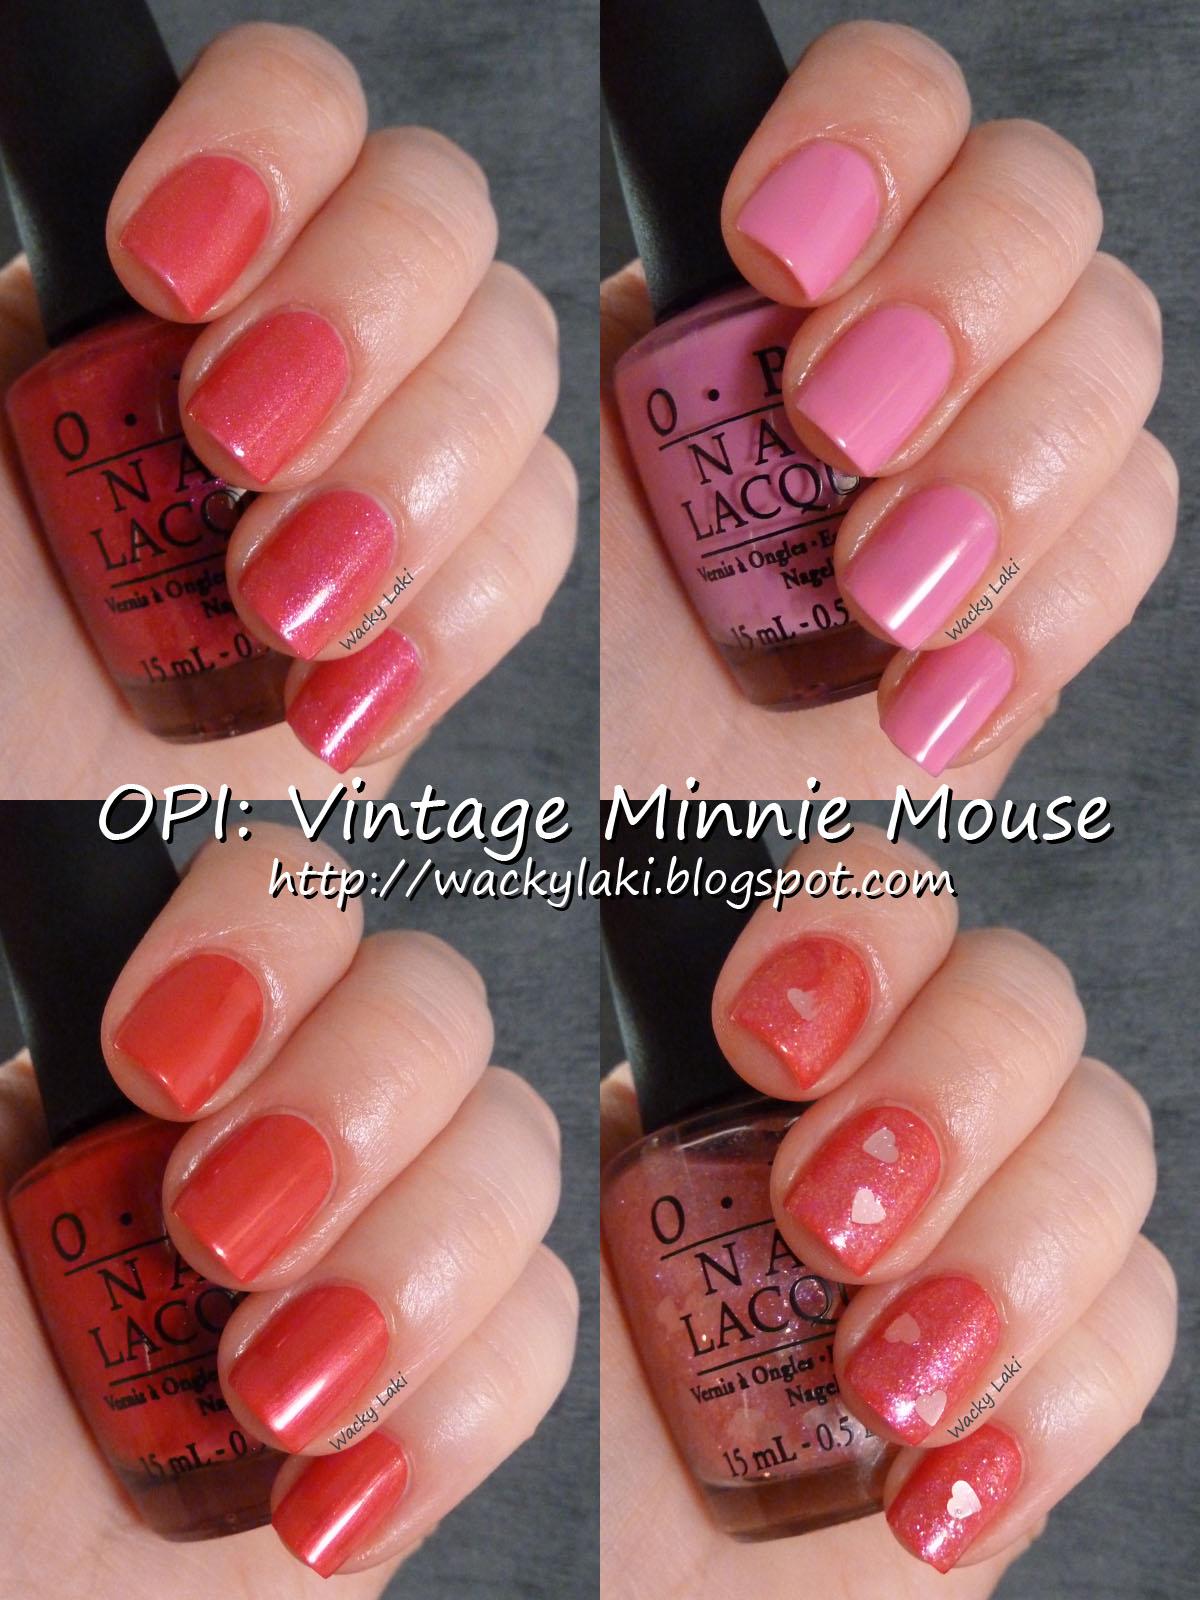 Wacky Laki Opi Vintage Minnie Mouse Collection